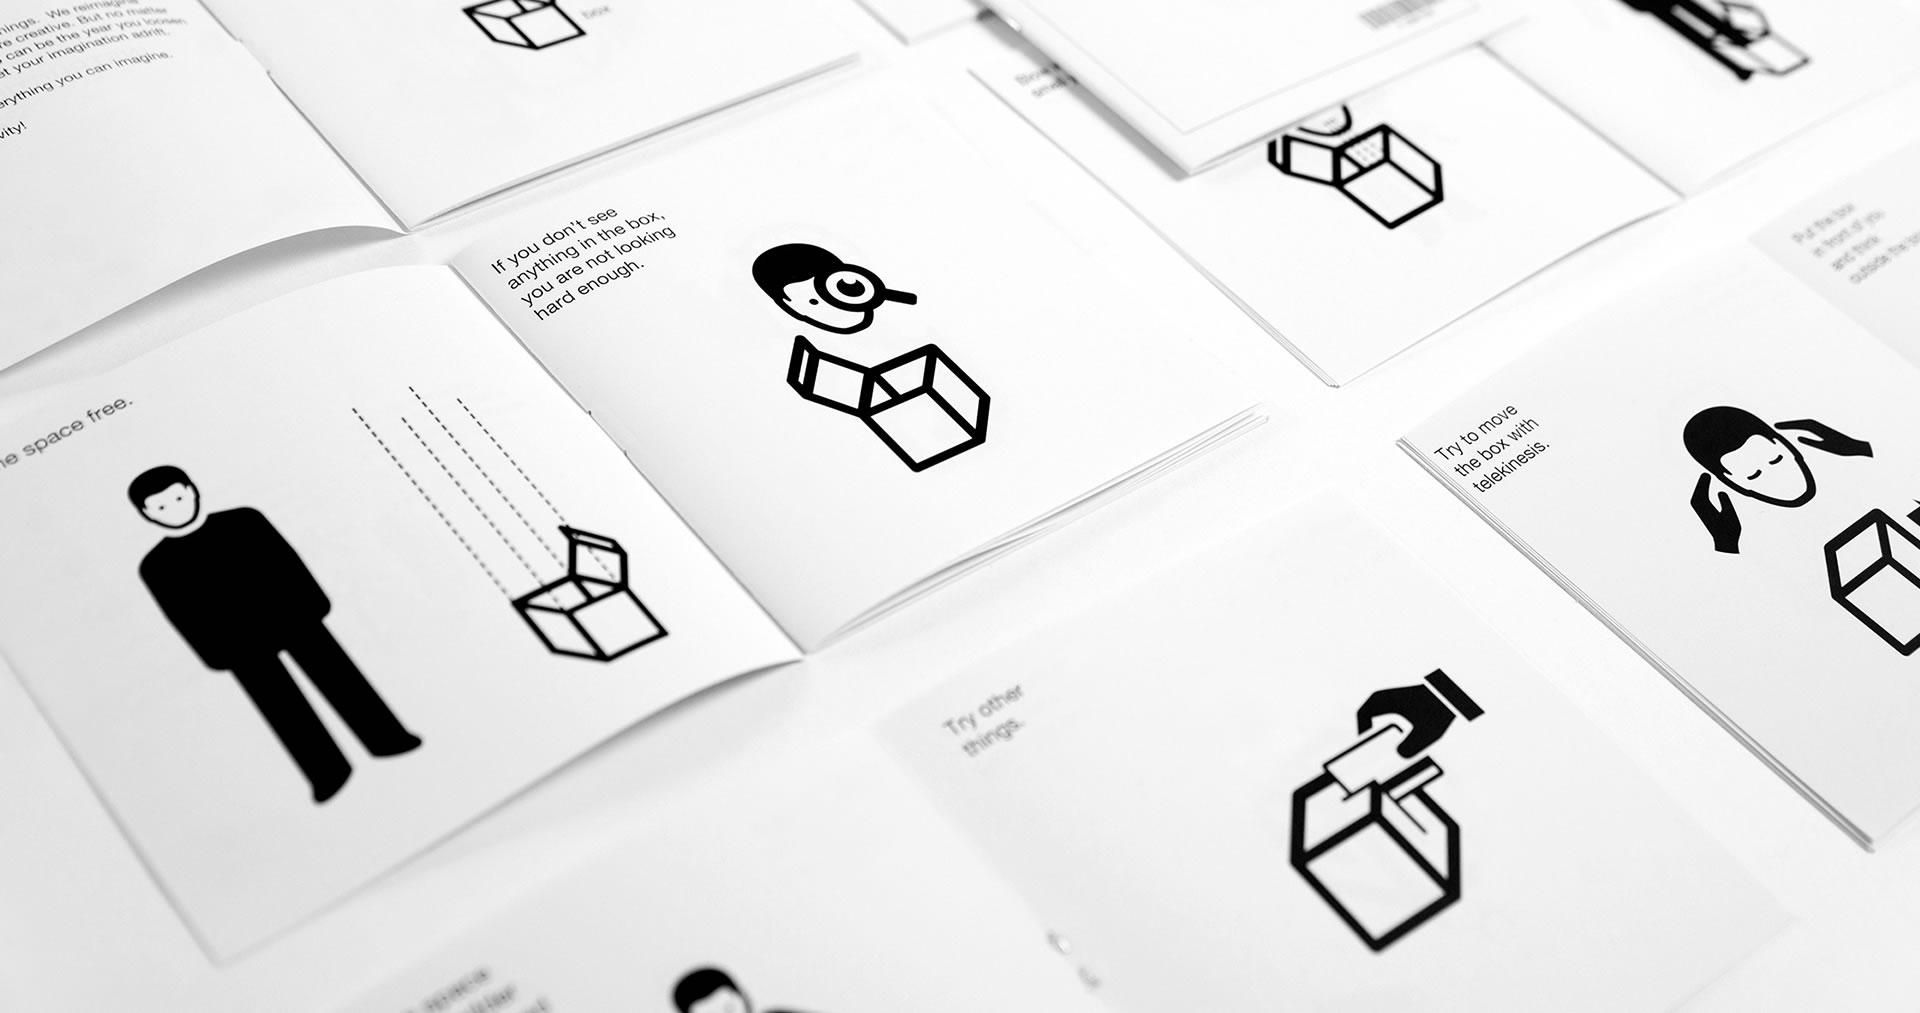 Nonobject's empty box instruction manual illustrations